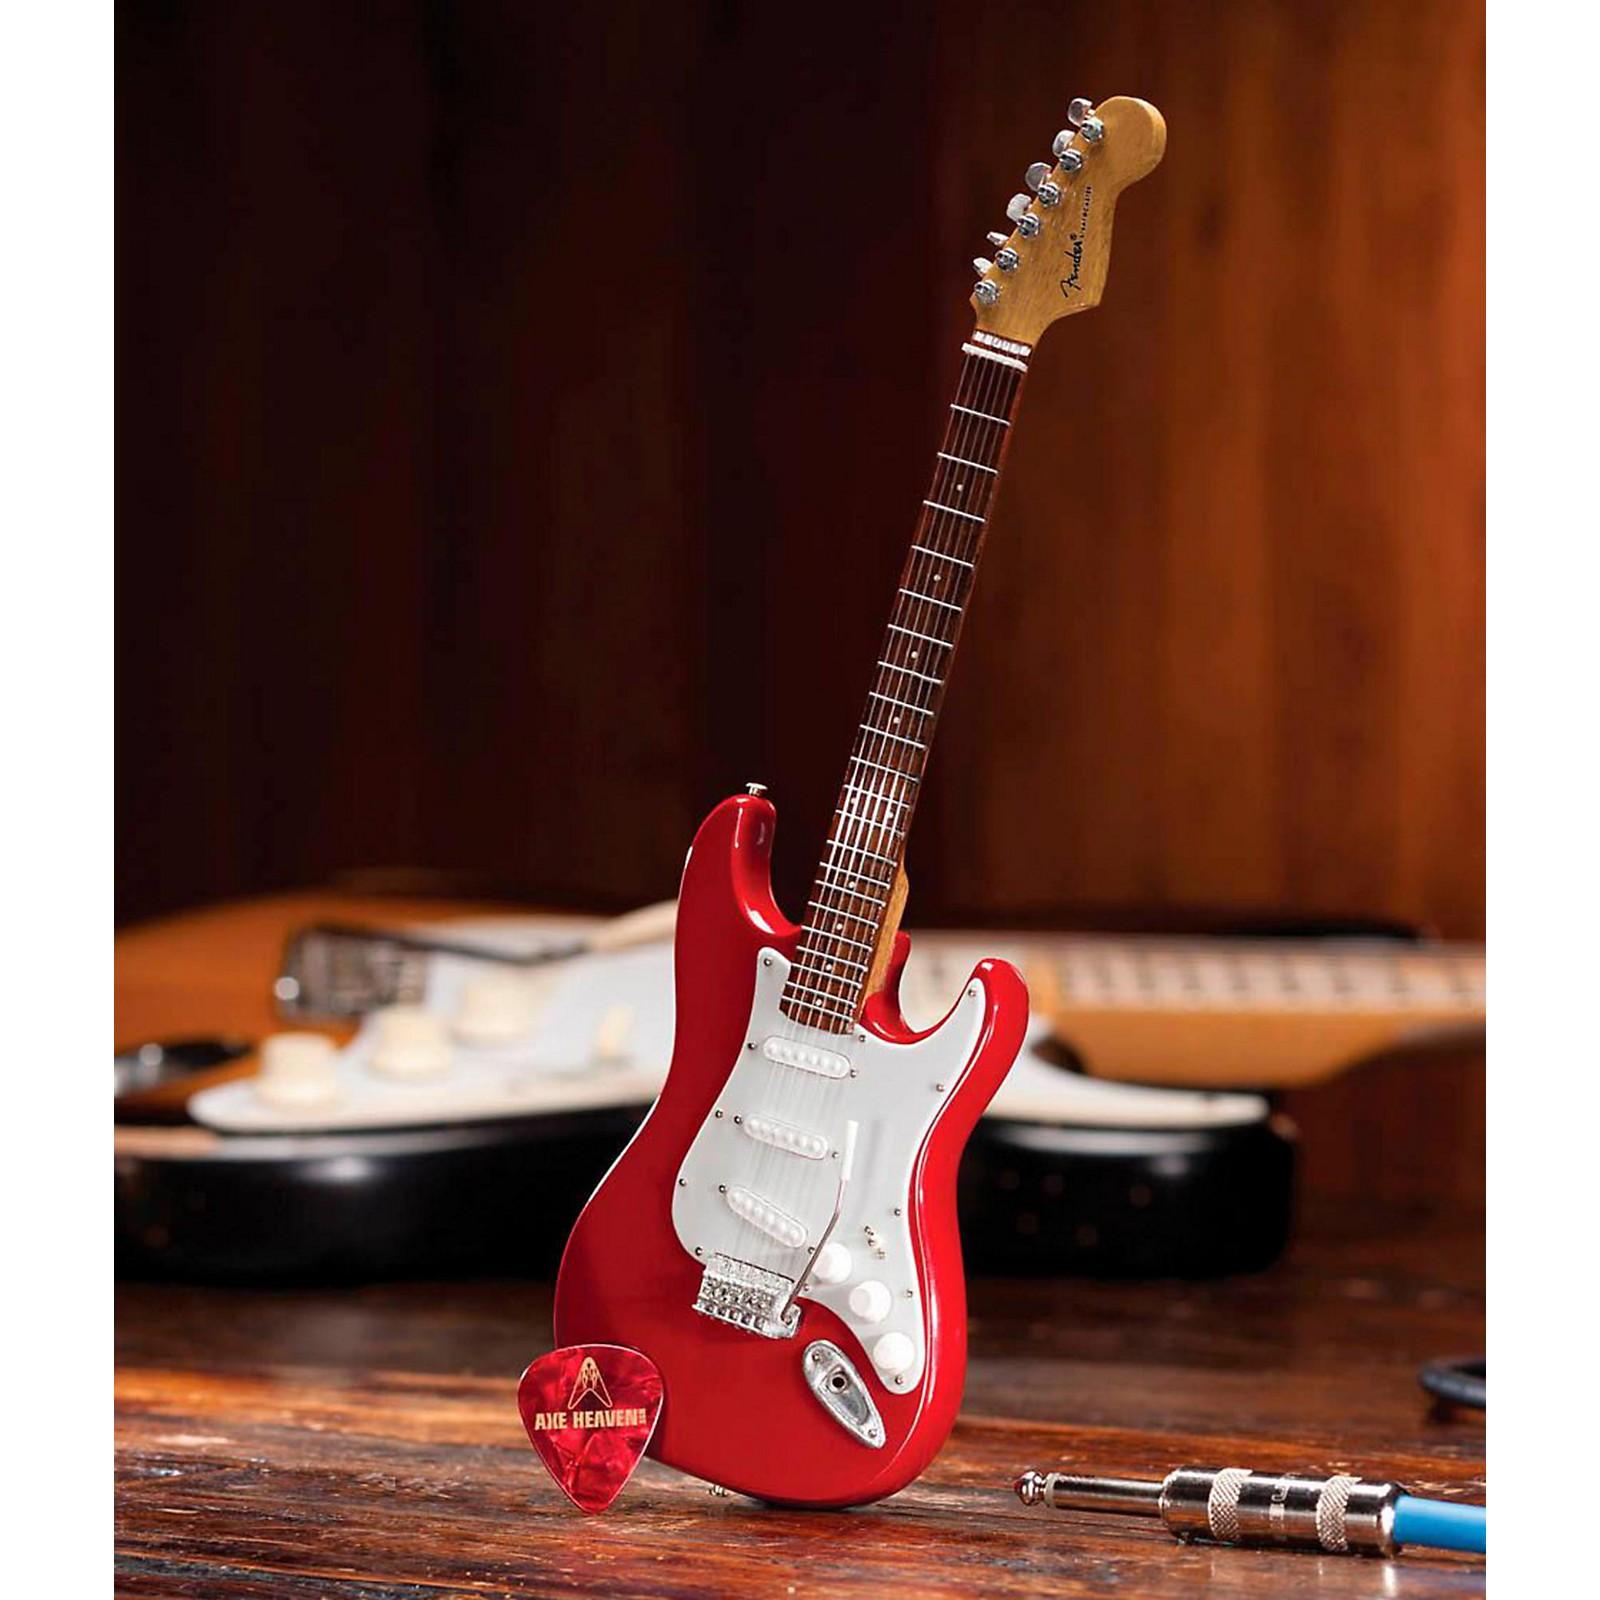 Axe Heaven Fender Stratocaster Classic Red Miniature Guitar Replica Collectible